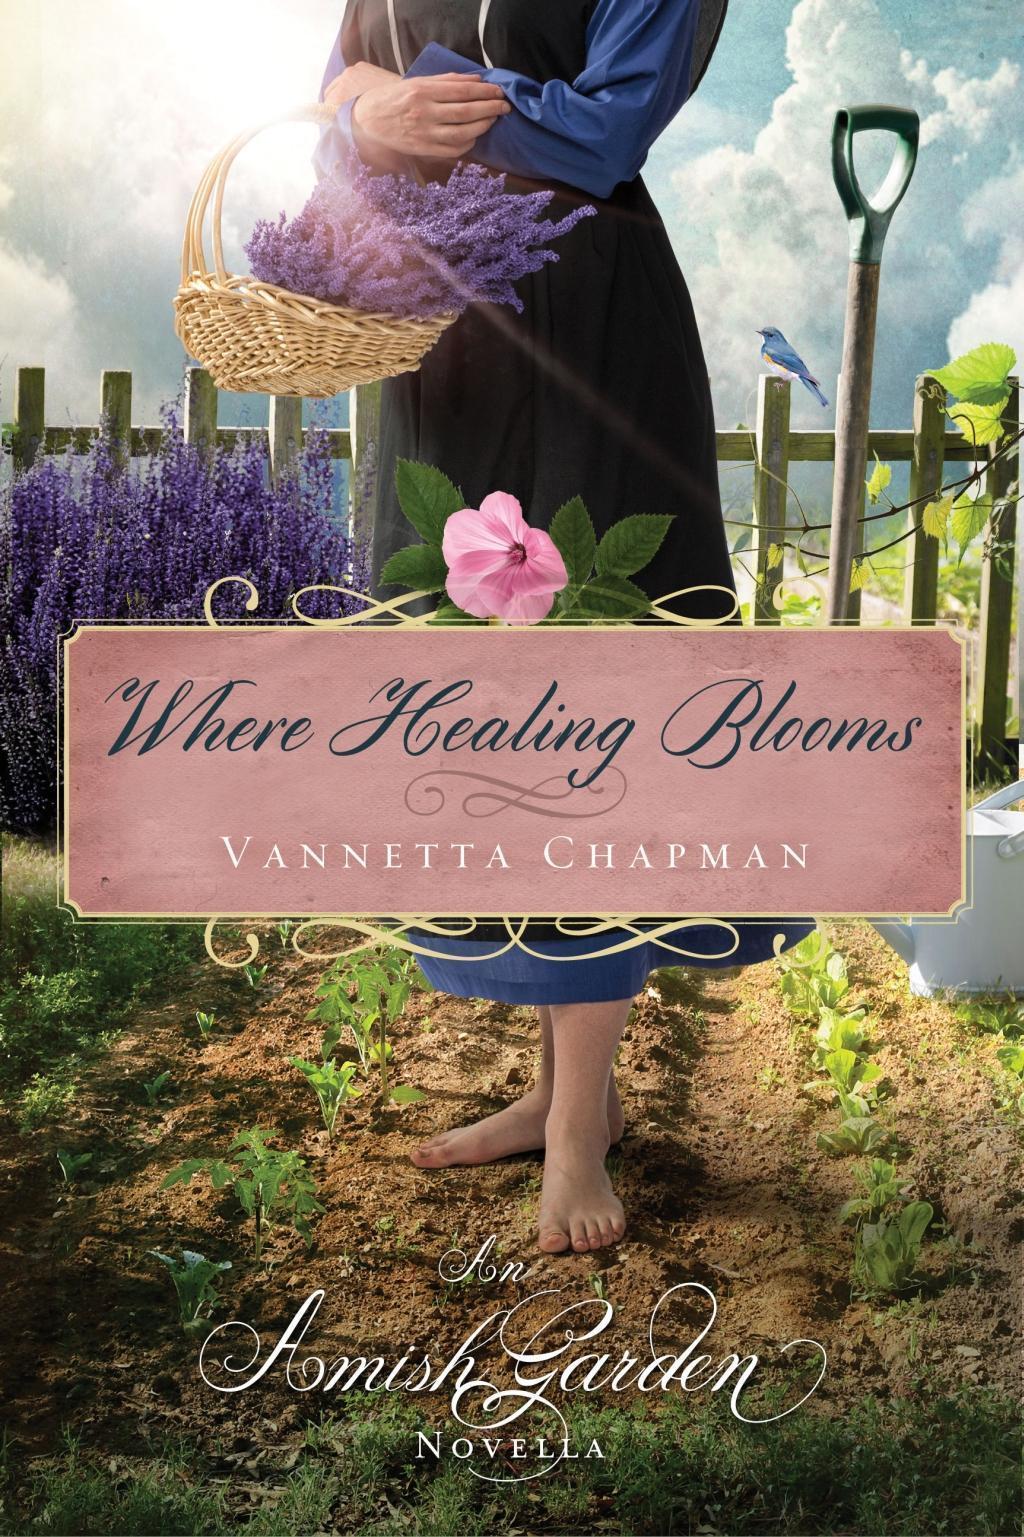 Where Healing Blooms